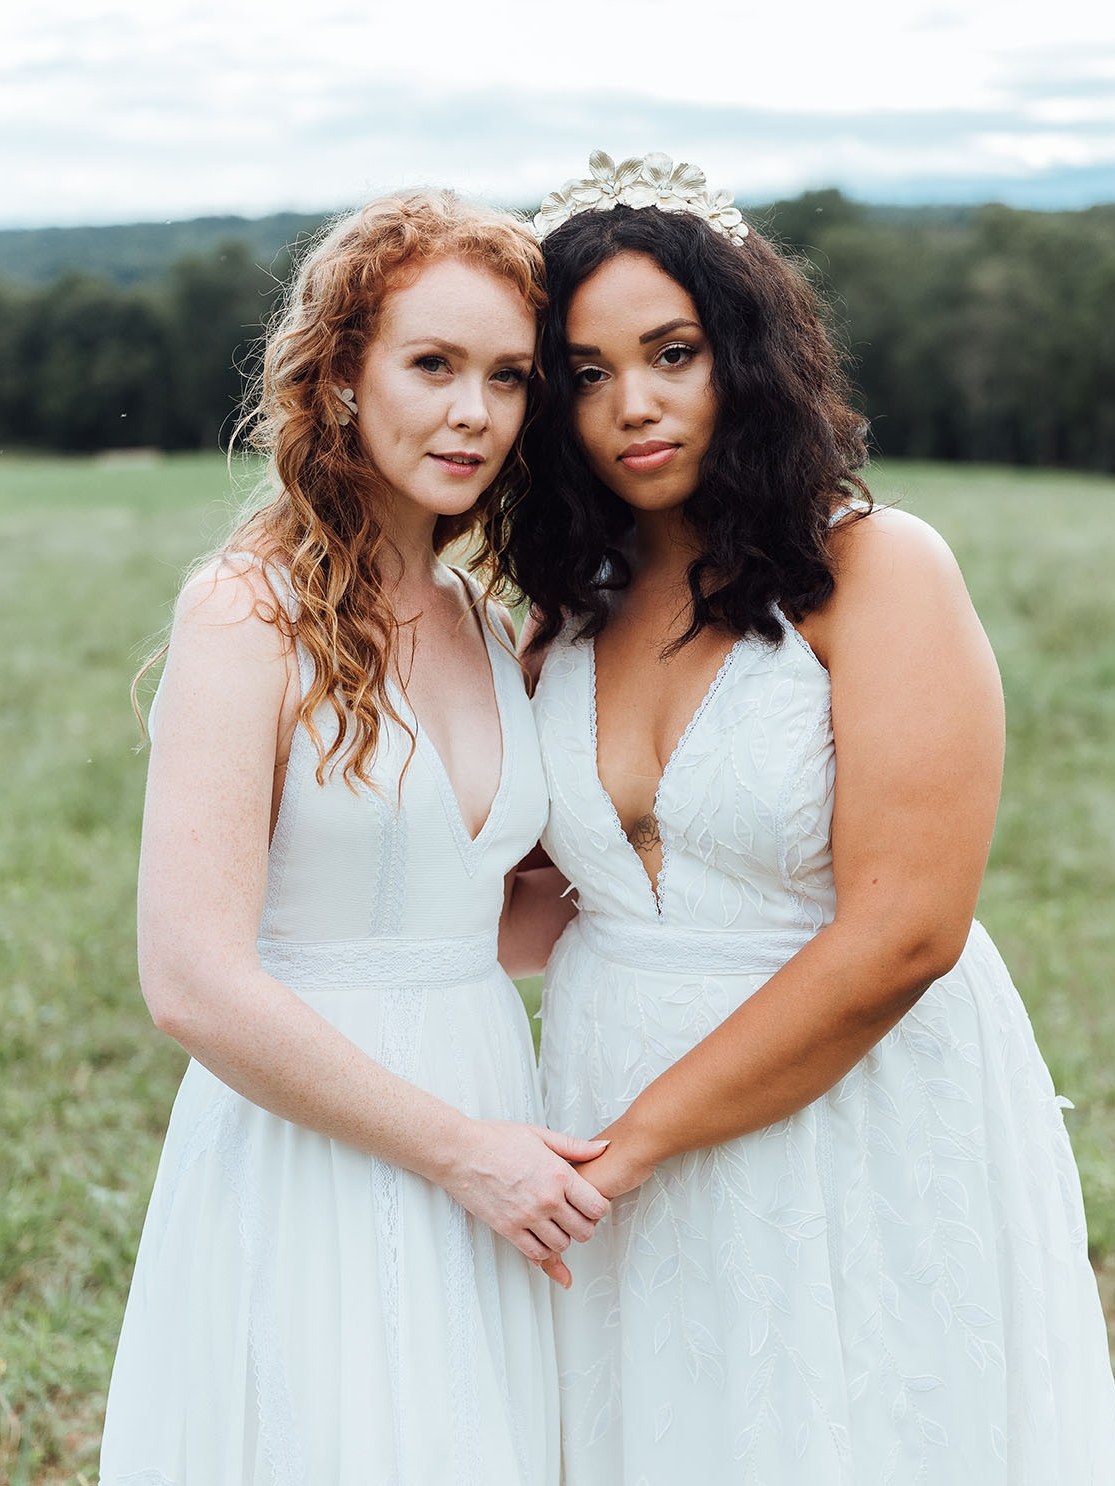 WSPCo-Gather-Greene-Rebecca-Schoneveld-Bridal-207_boho_brides_meadow_romantic_gown.jpg